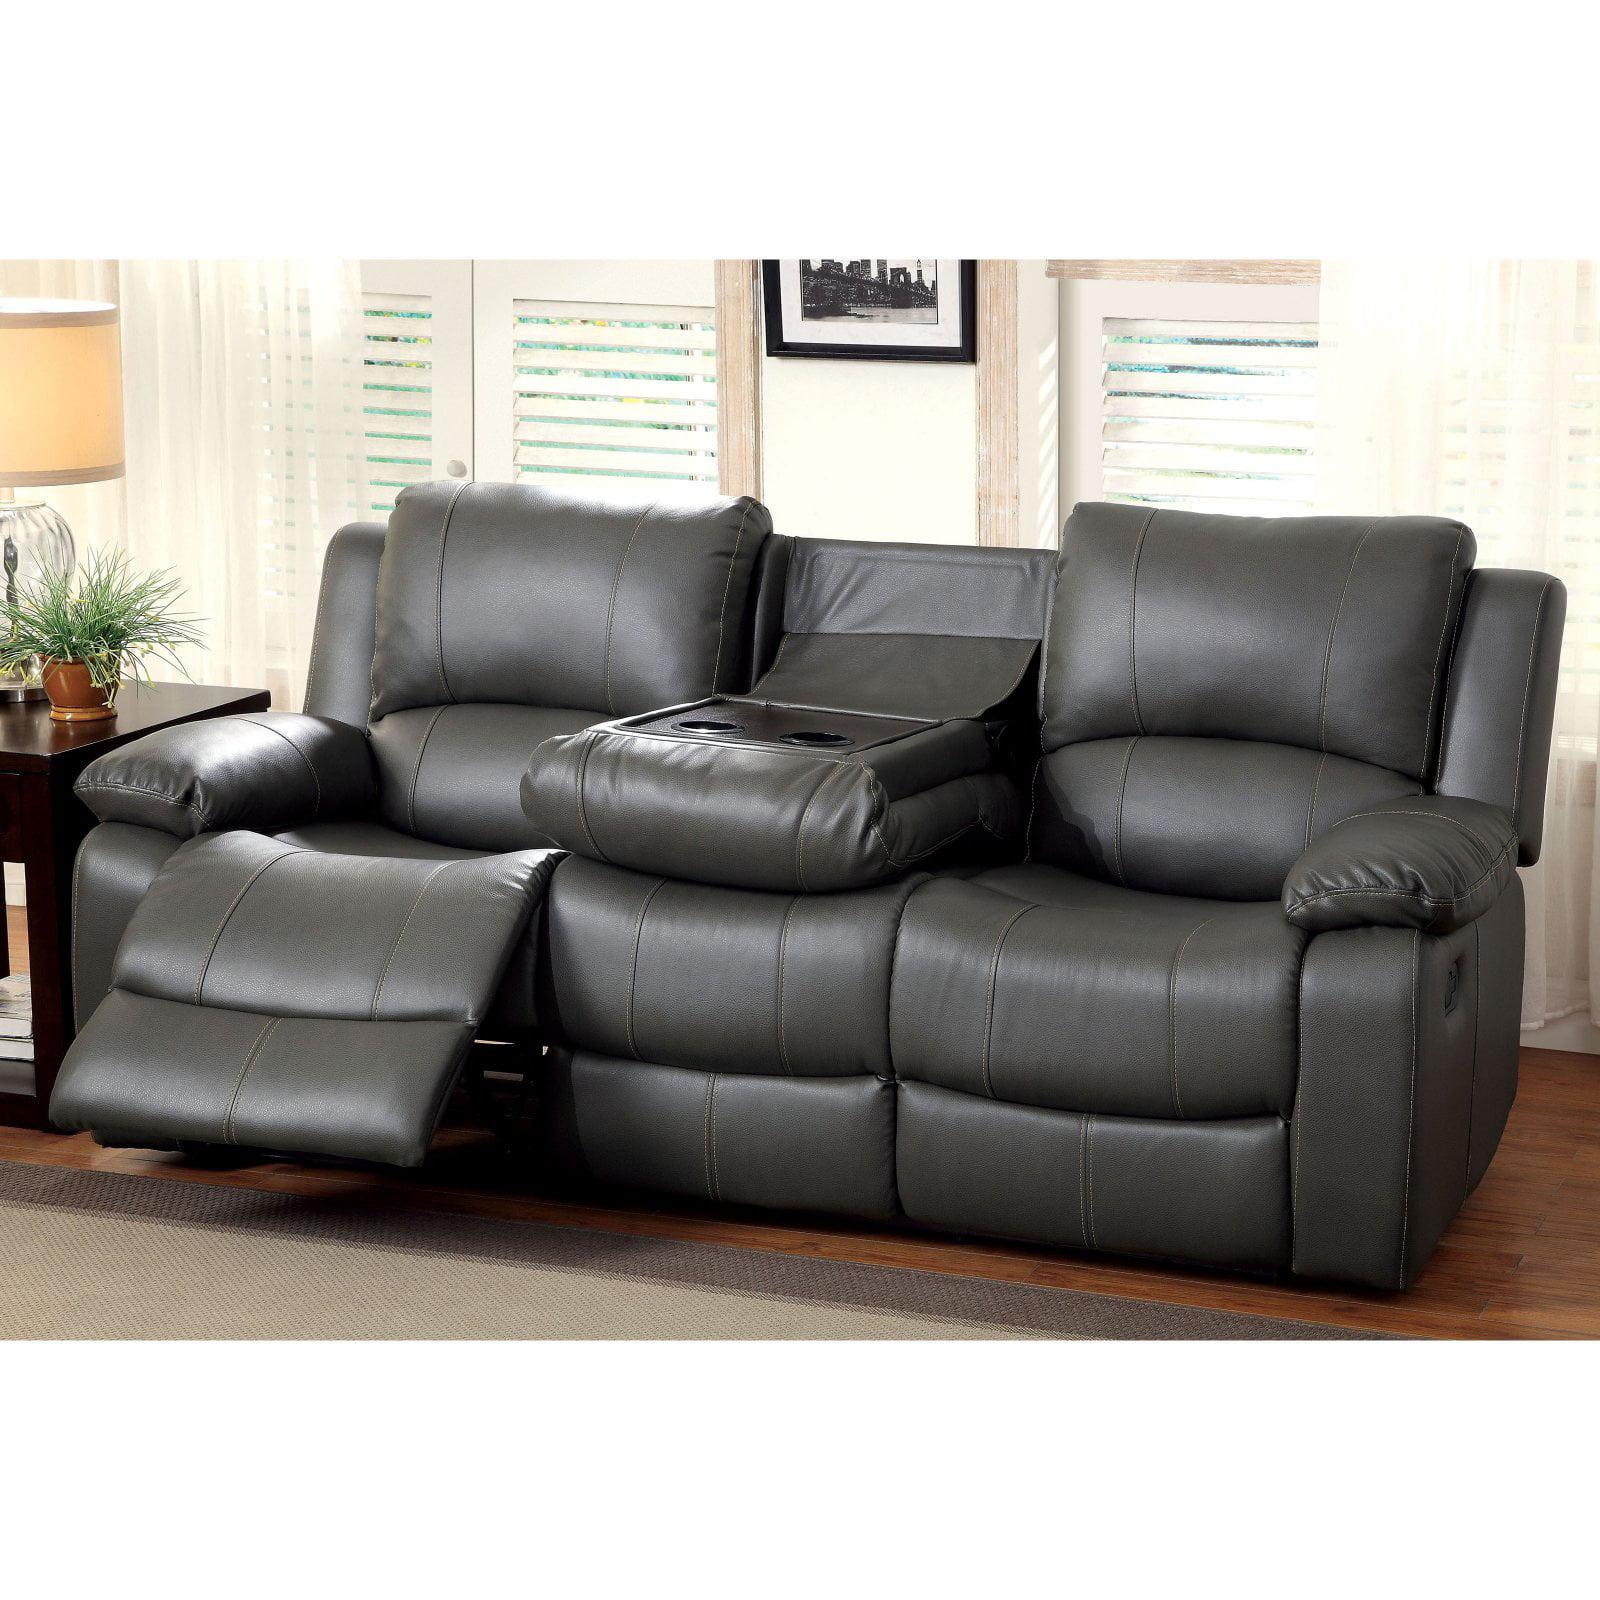 America Rathbone Recliner Sofa